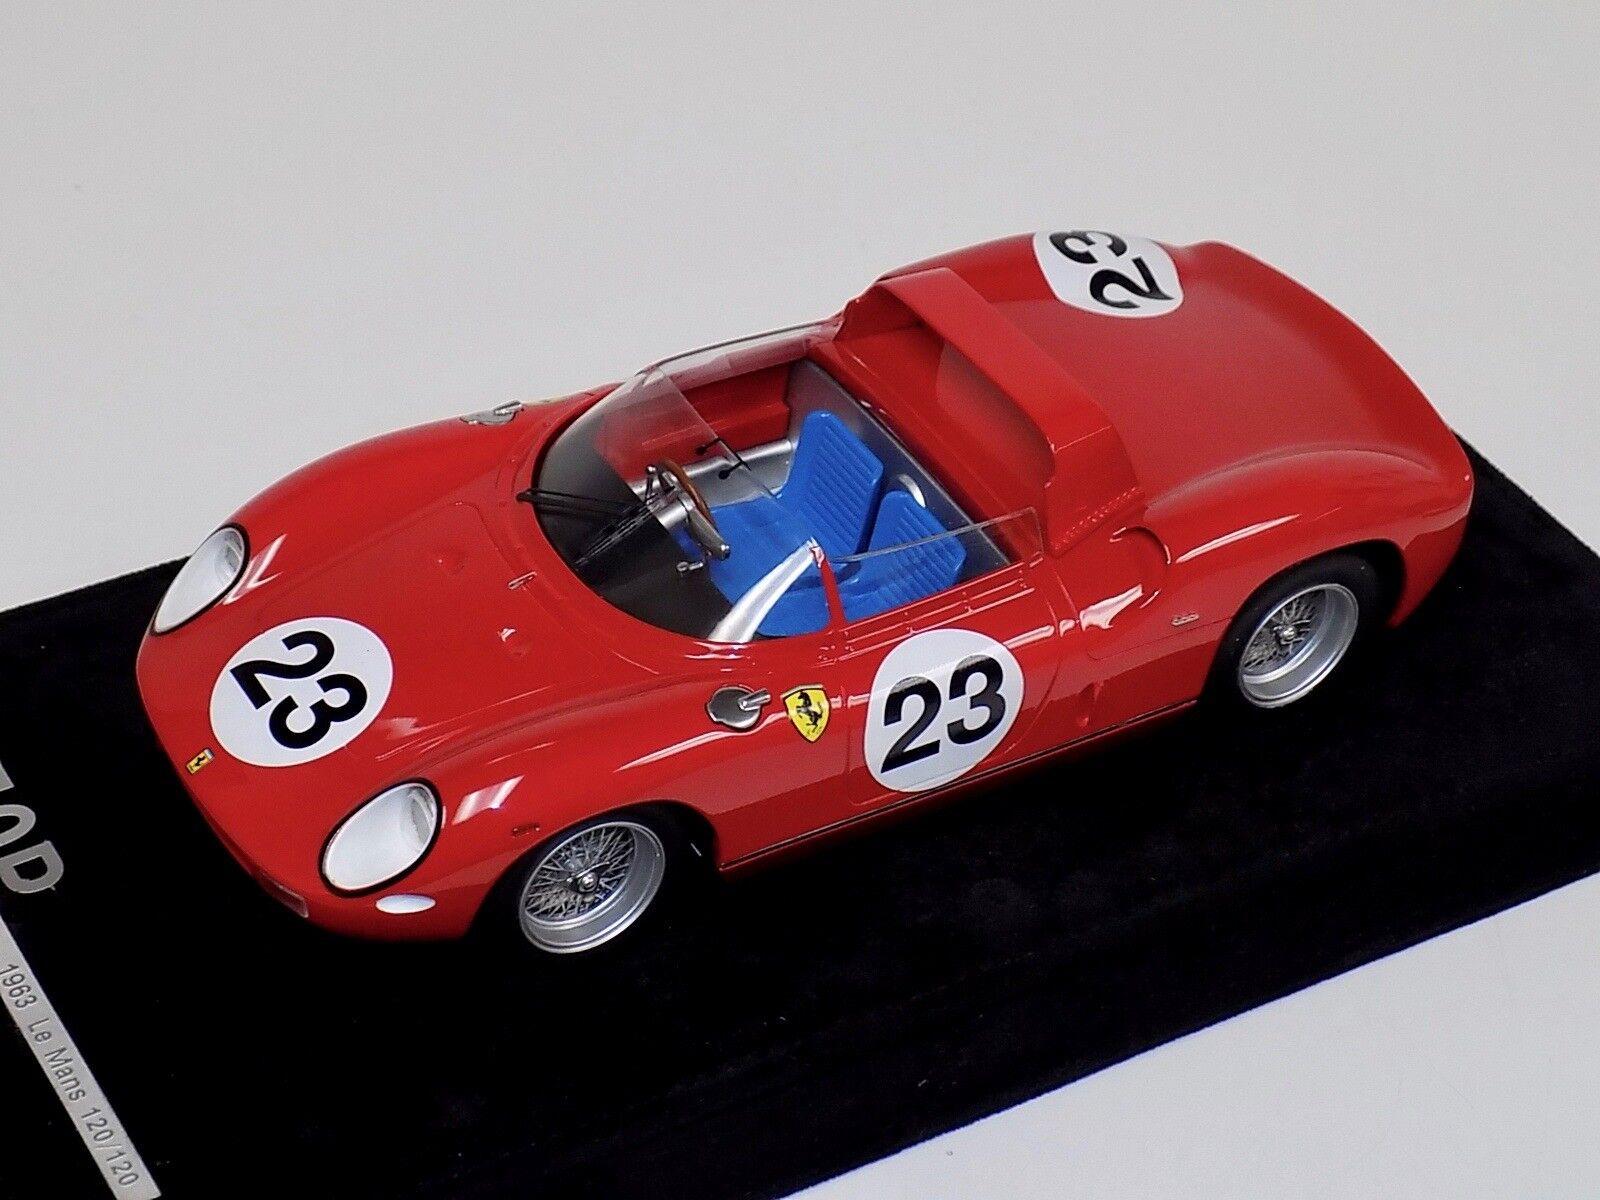 seguro de calidad 1 18 Ferrari 250 P 1963 1963 1963 Le Mans coche  23 Modelo  120 of120 f9 Base de Alcántara  Tienda 2018